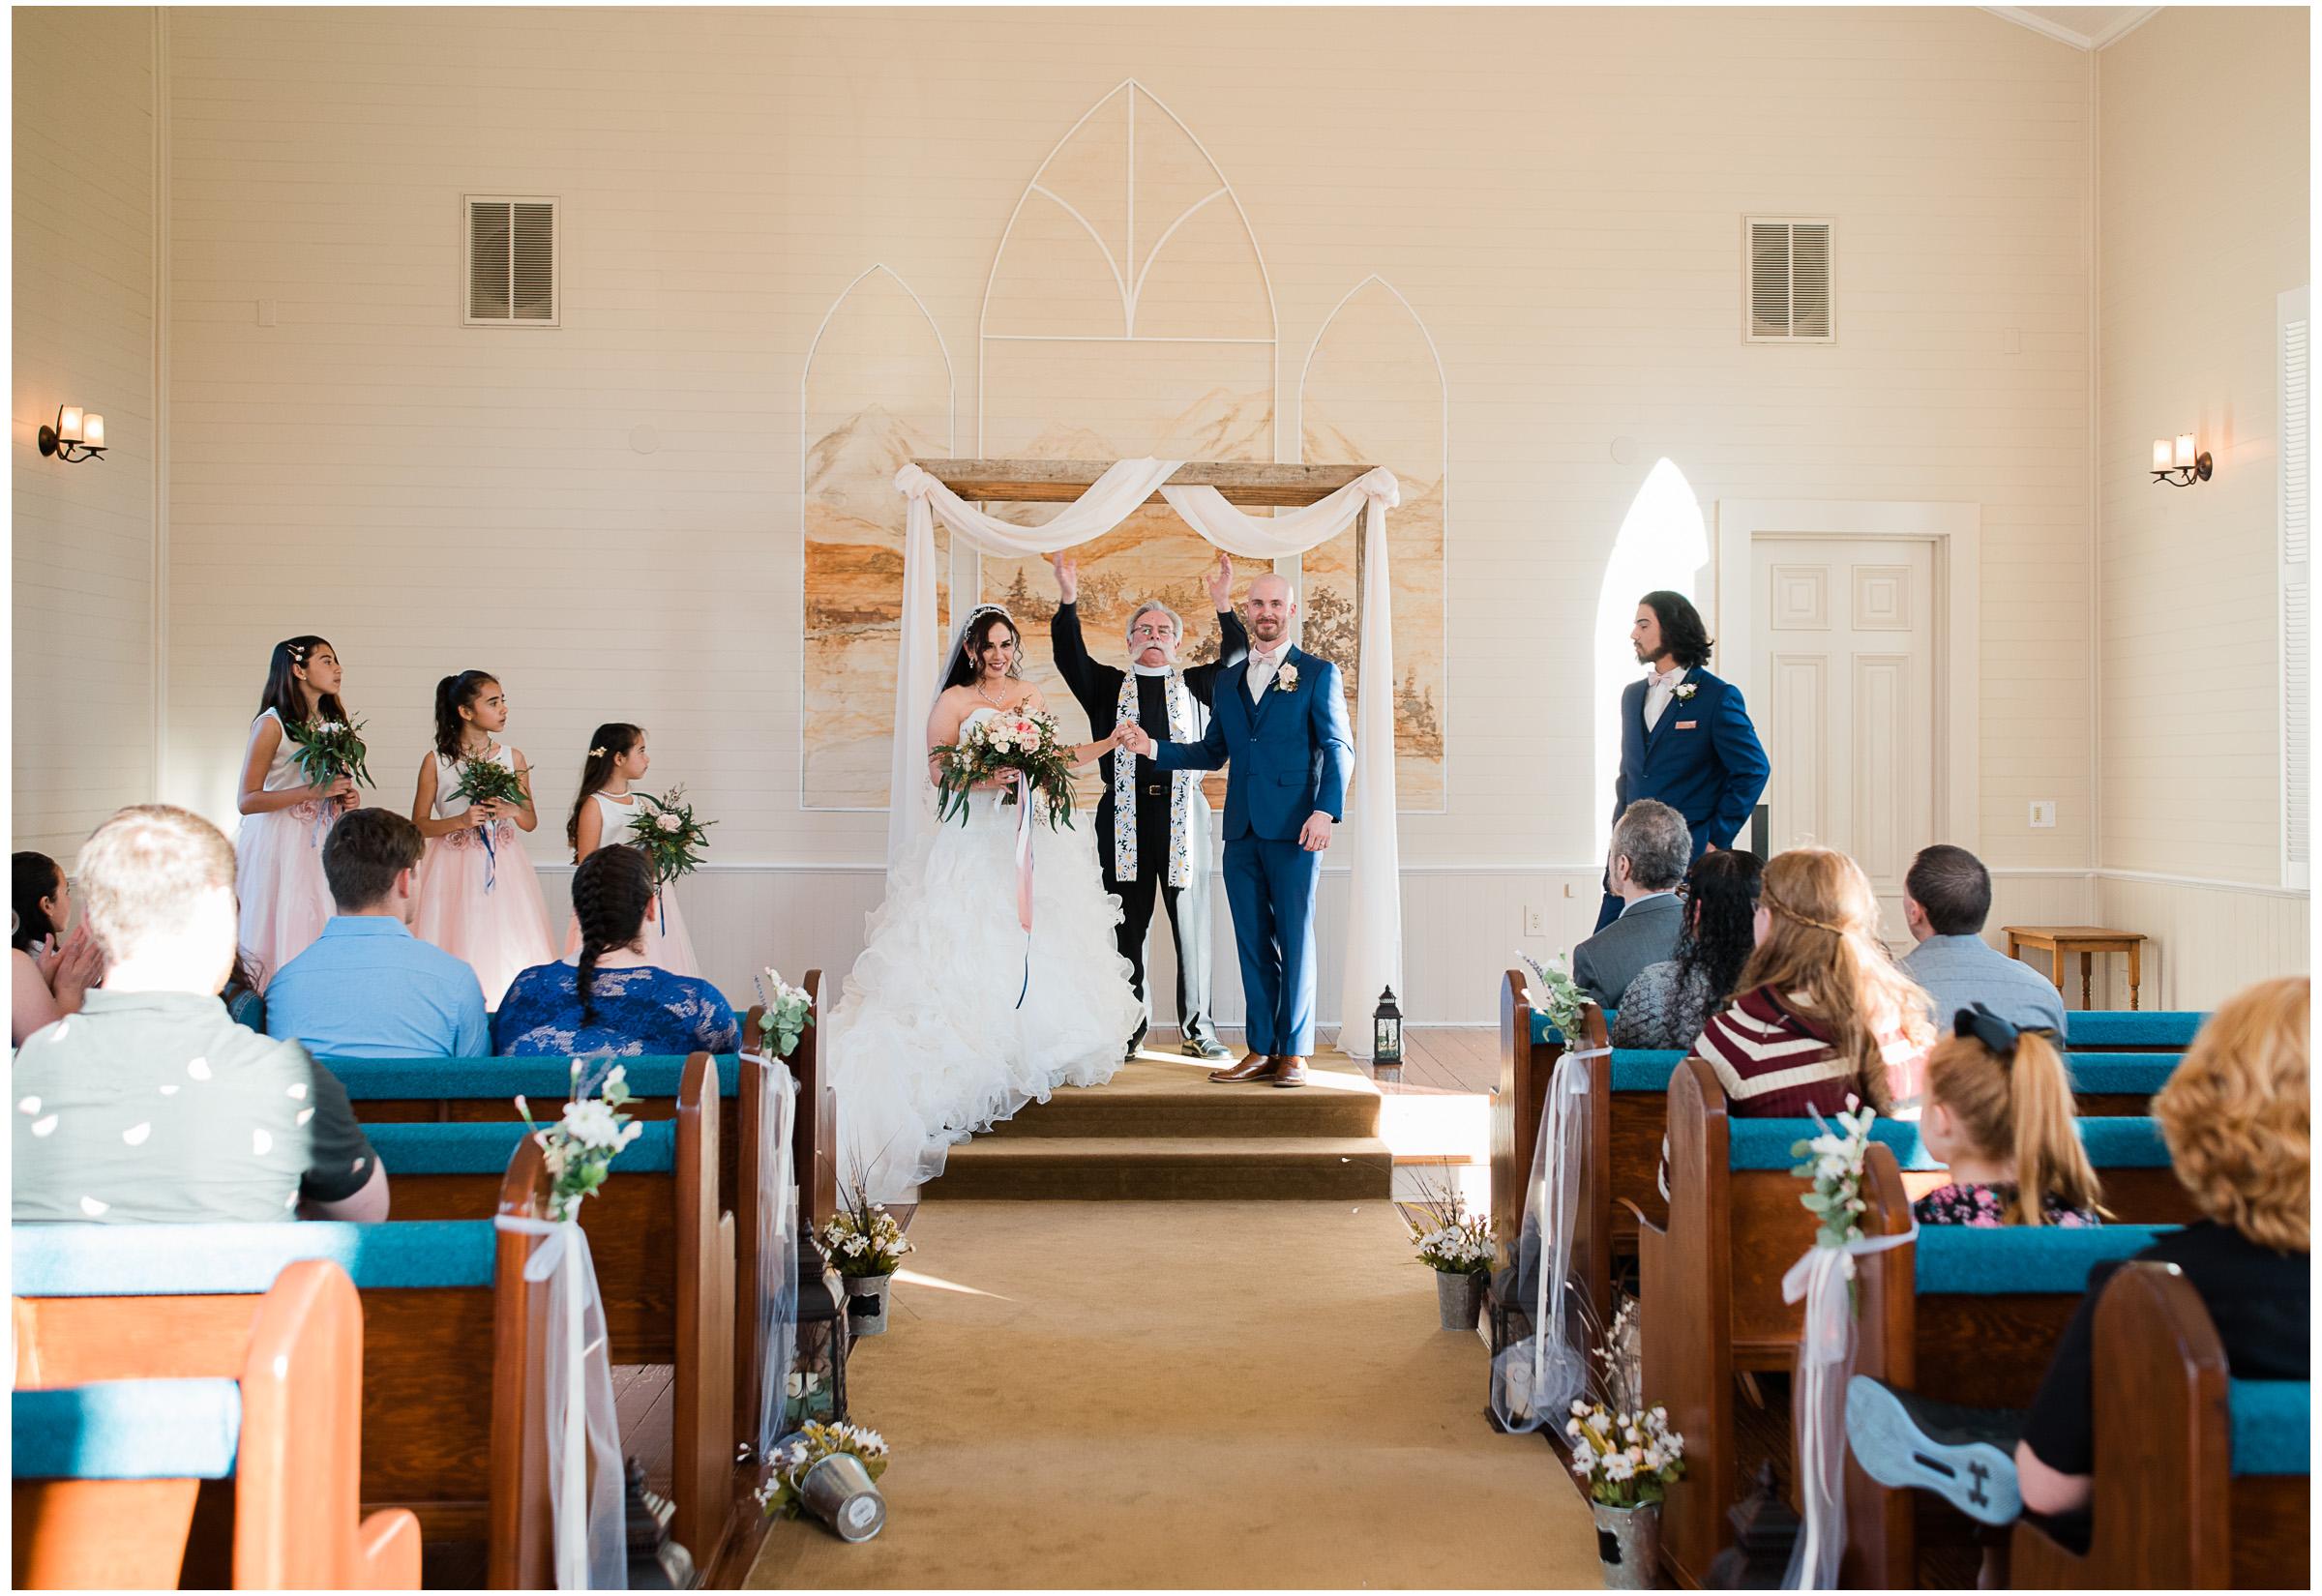 Sacramento Wedding - Sacramento Photographer - Justin Wilcox Photography - 15.jpg